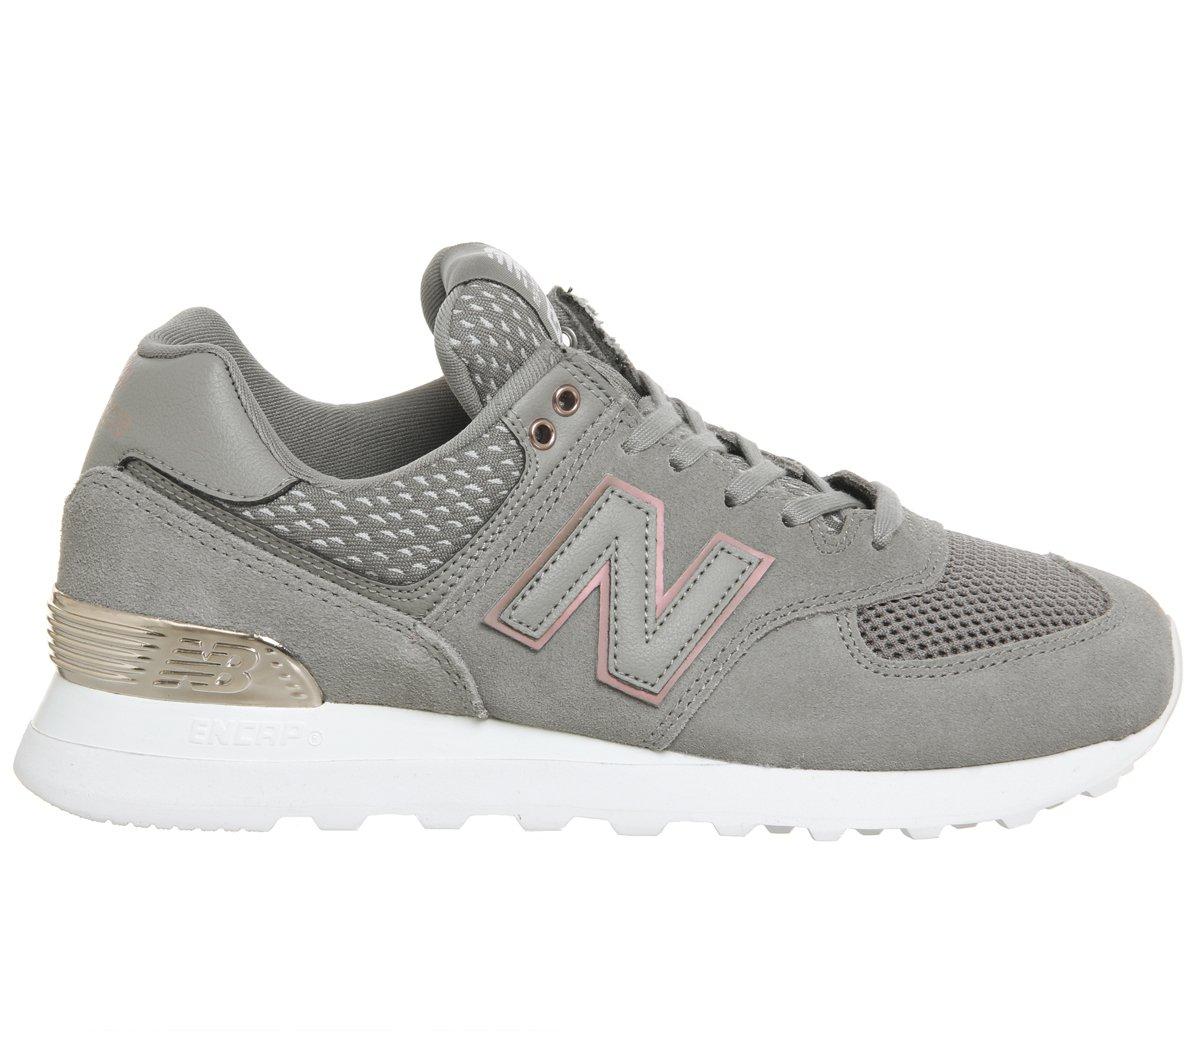 New Balance Wl574v2, Zapatillas para Mujer 36 EU|Gris